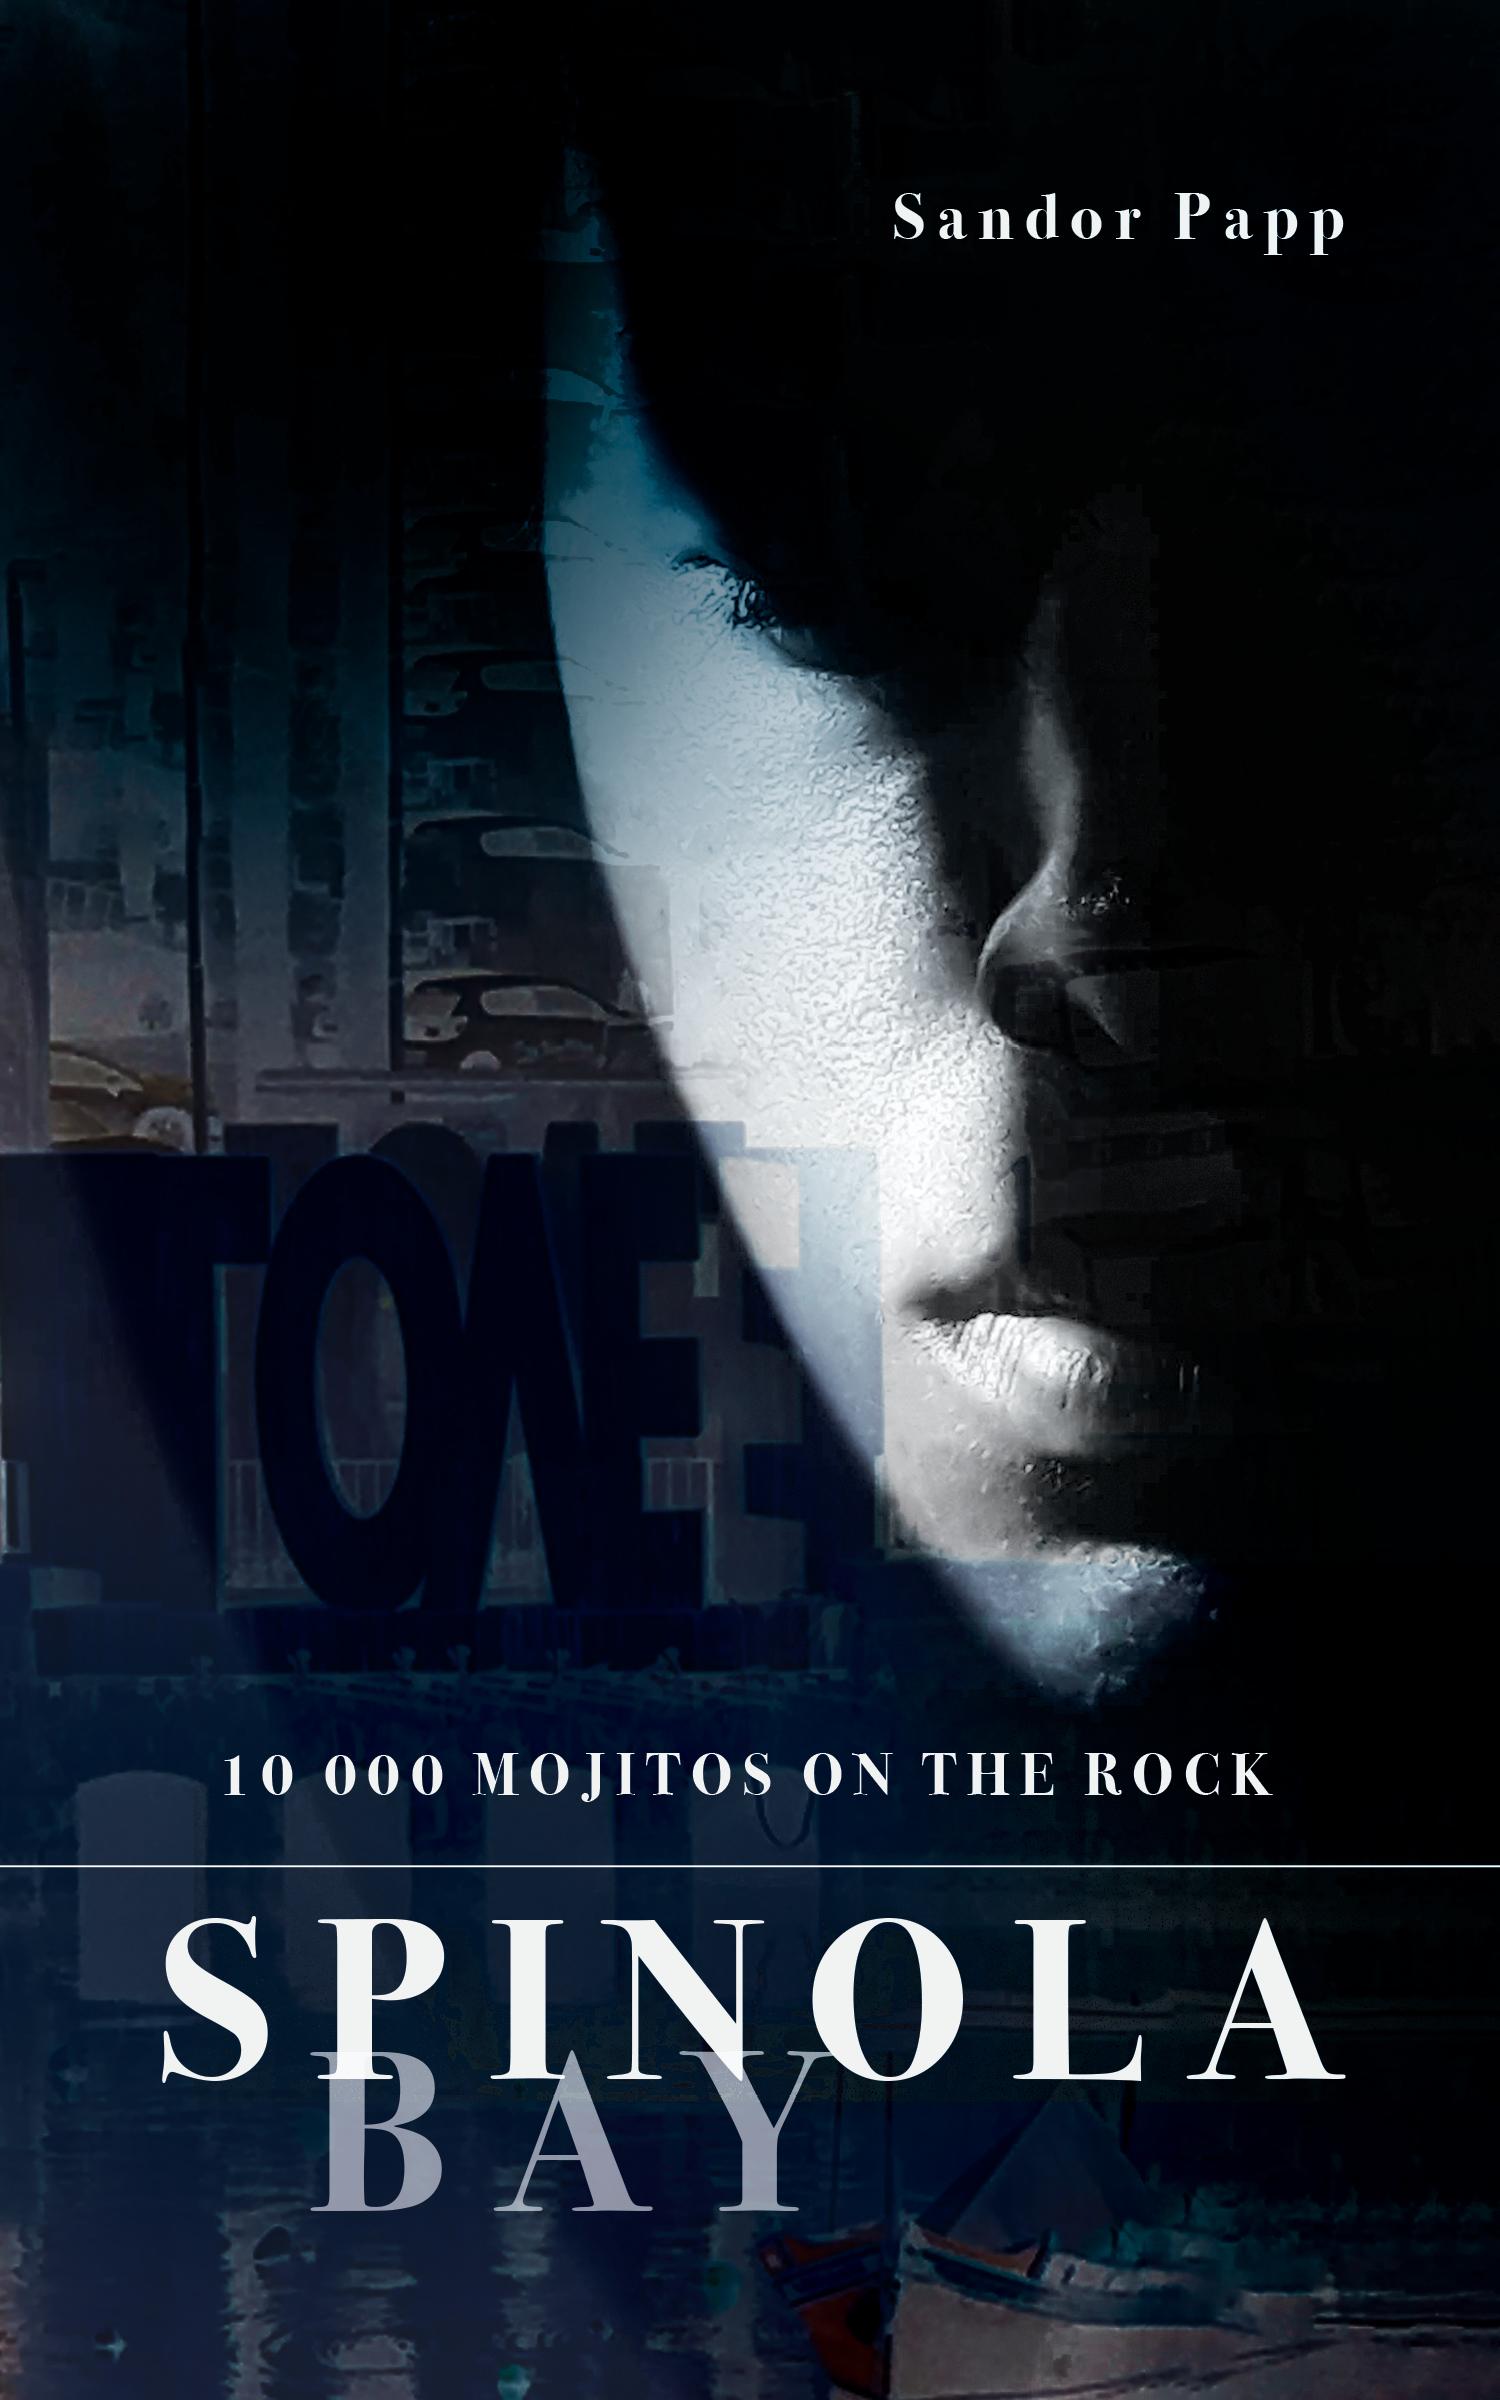 Spinola Bay: 10 000 mojitos on the rock